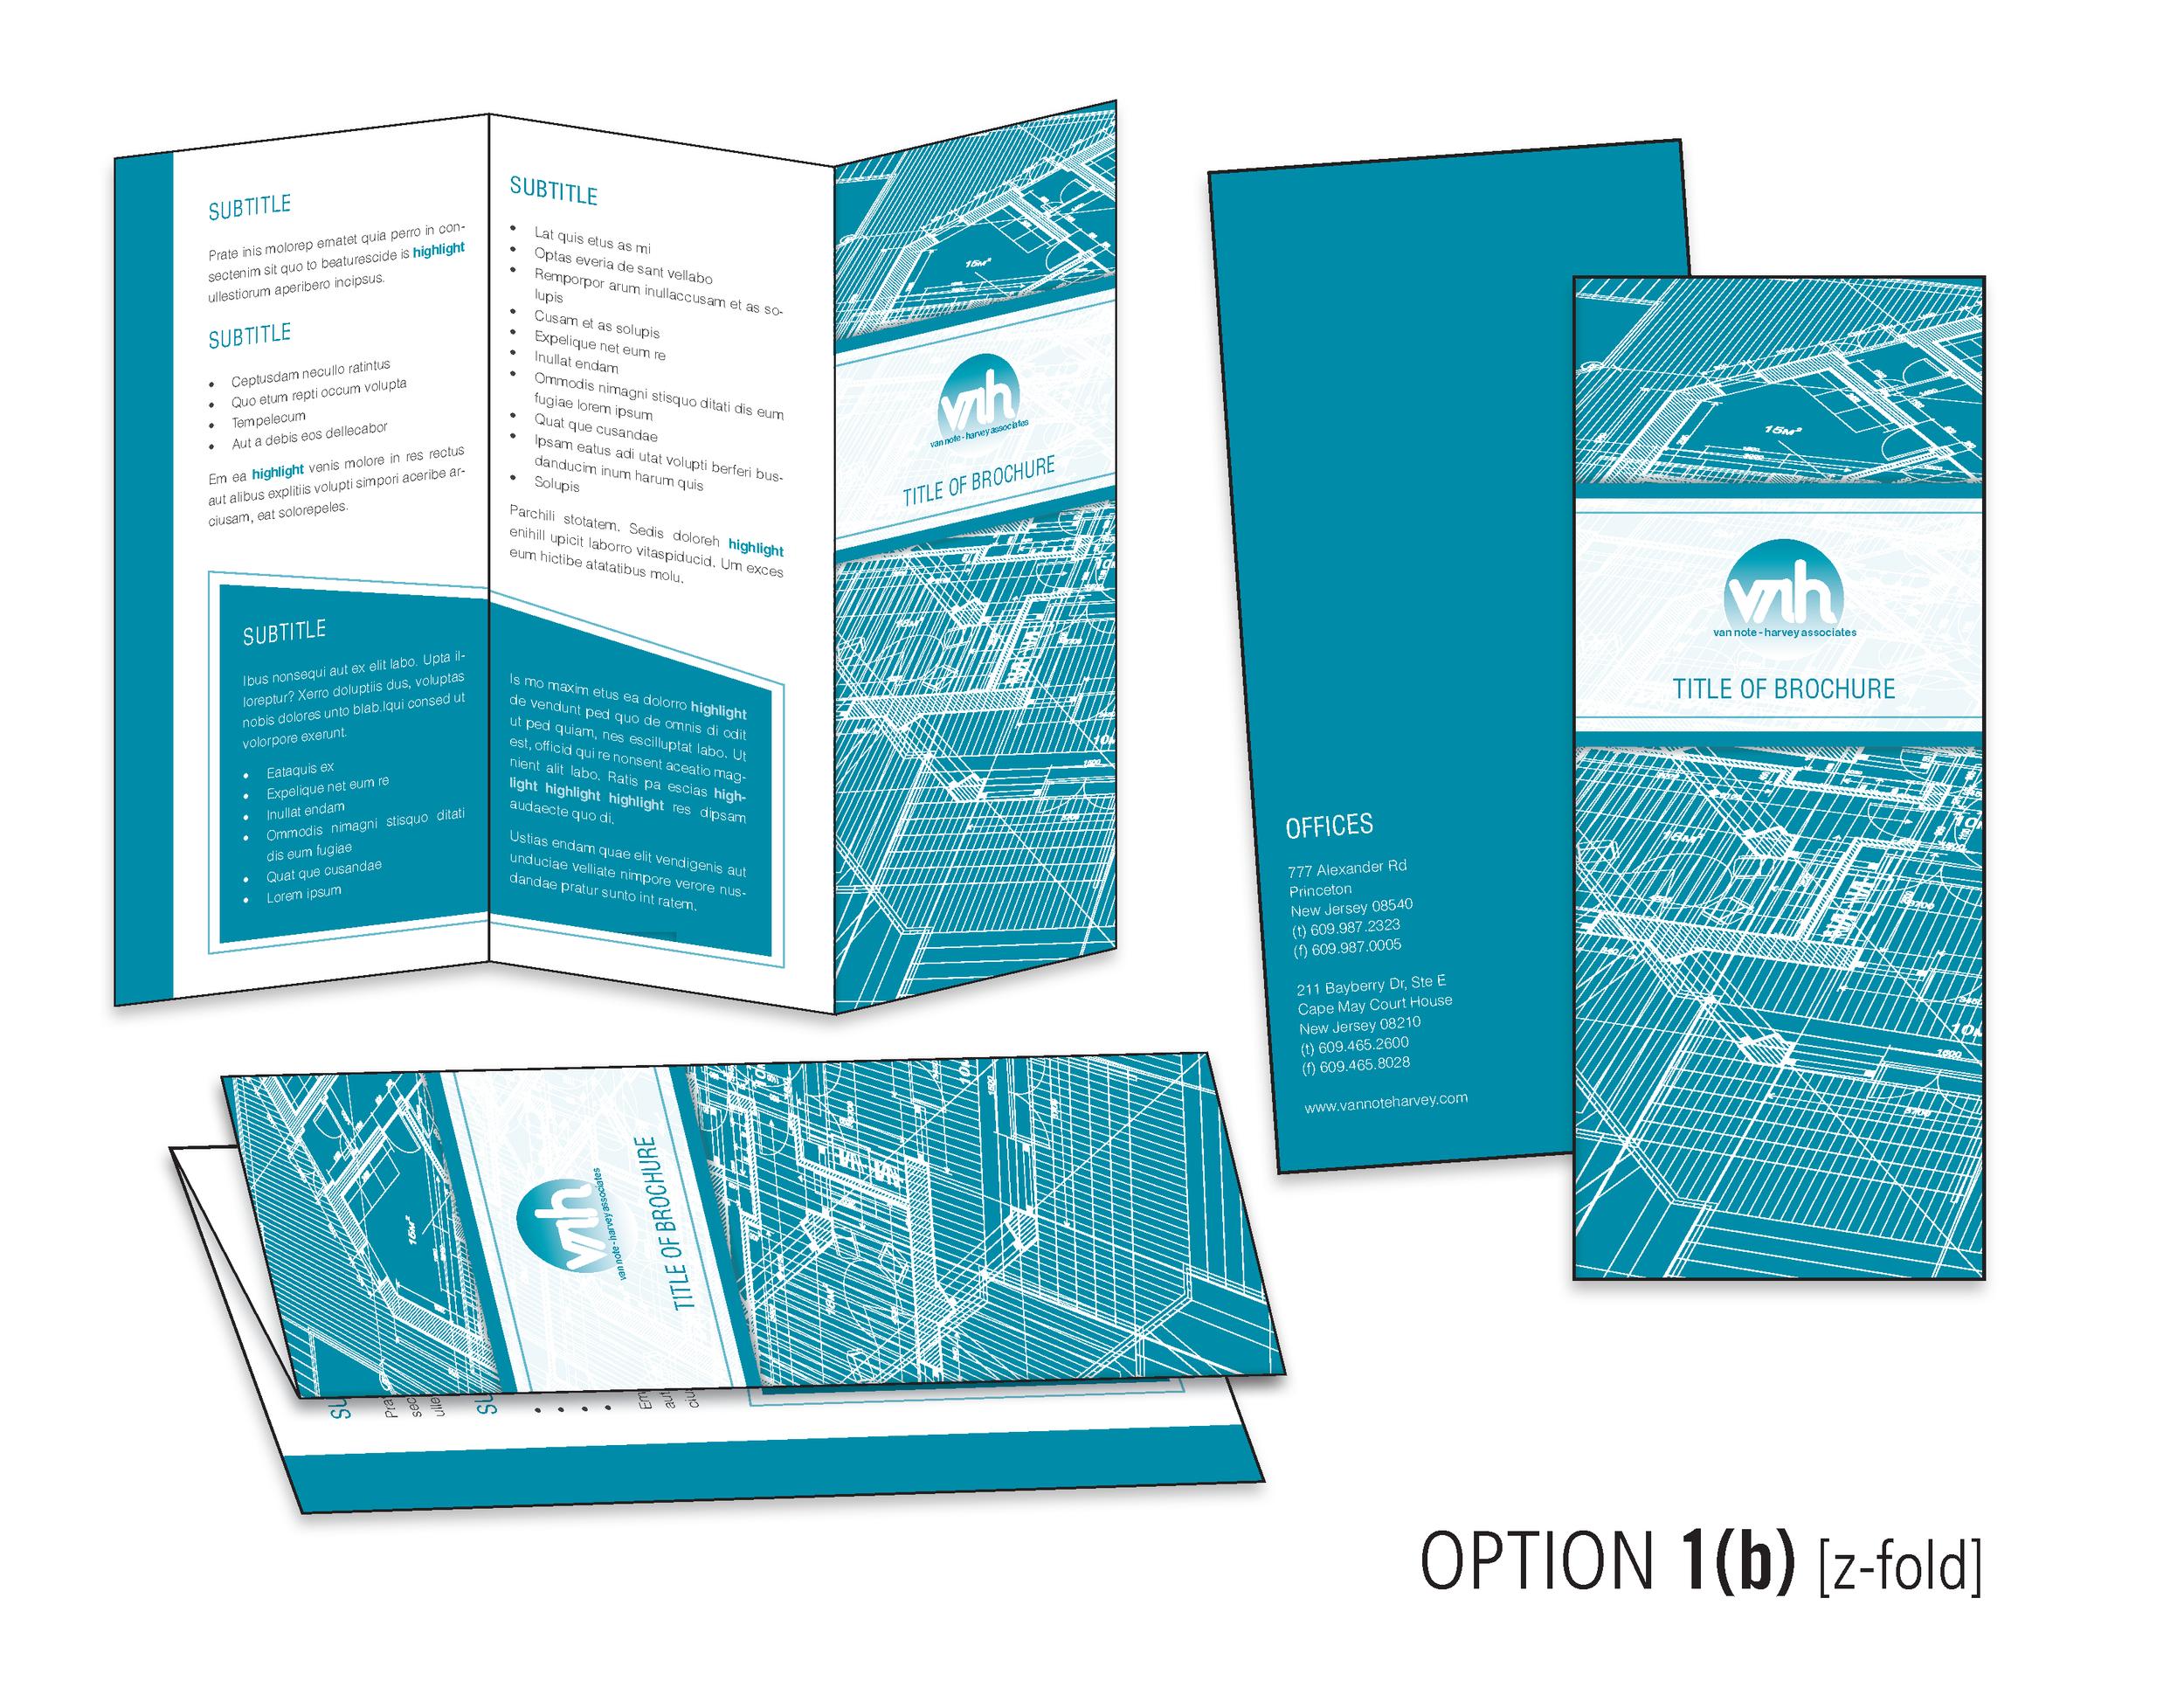 Round 1, Z-fold design option.